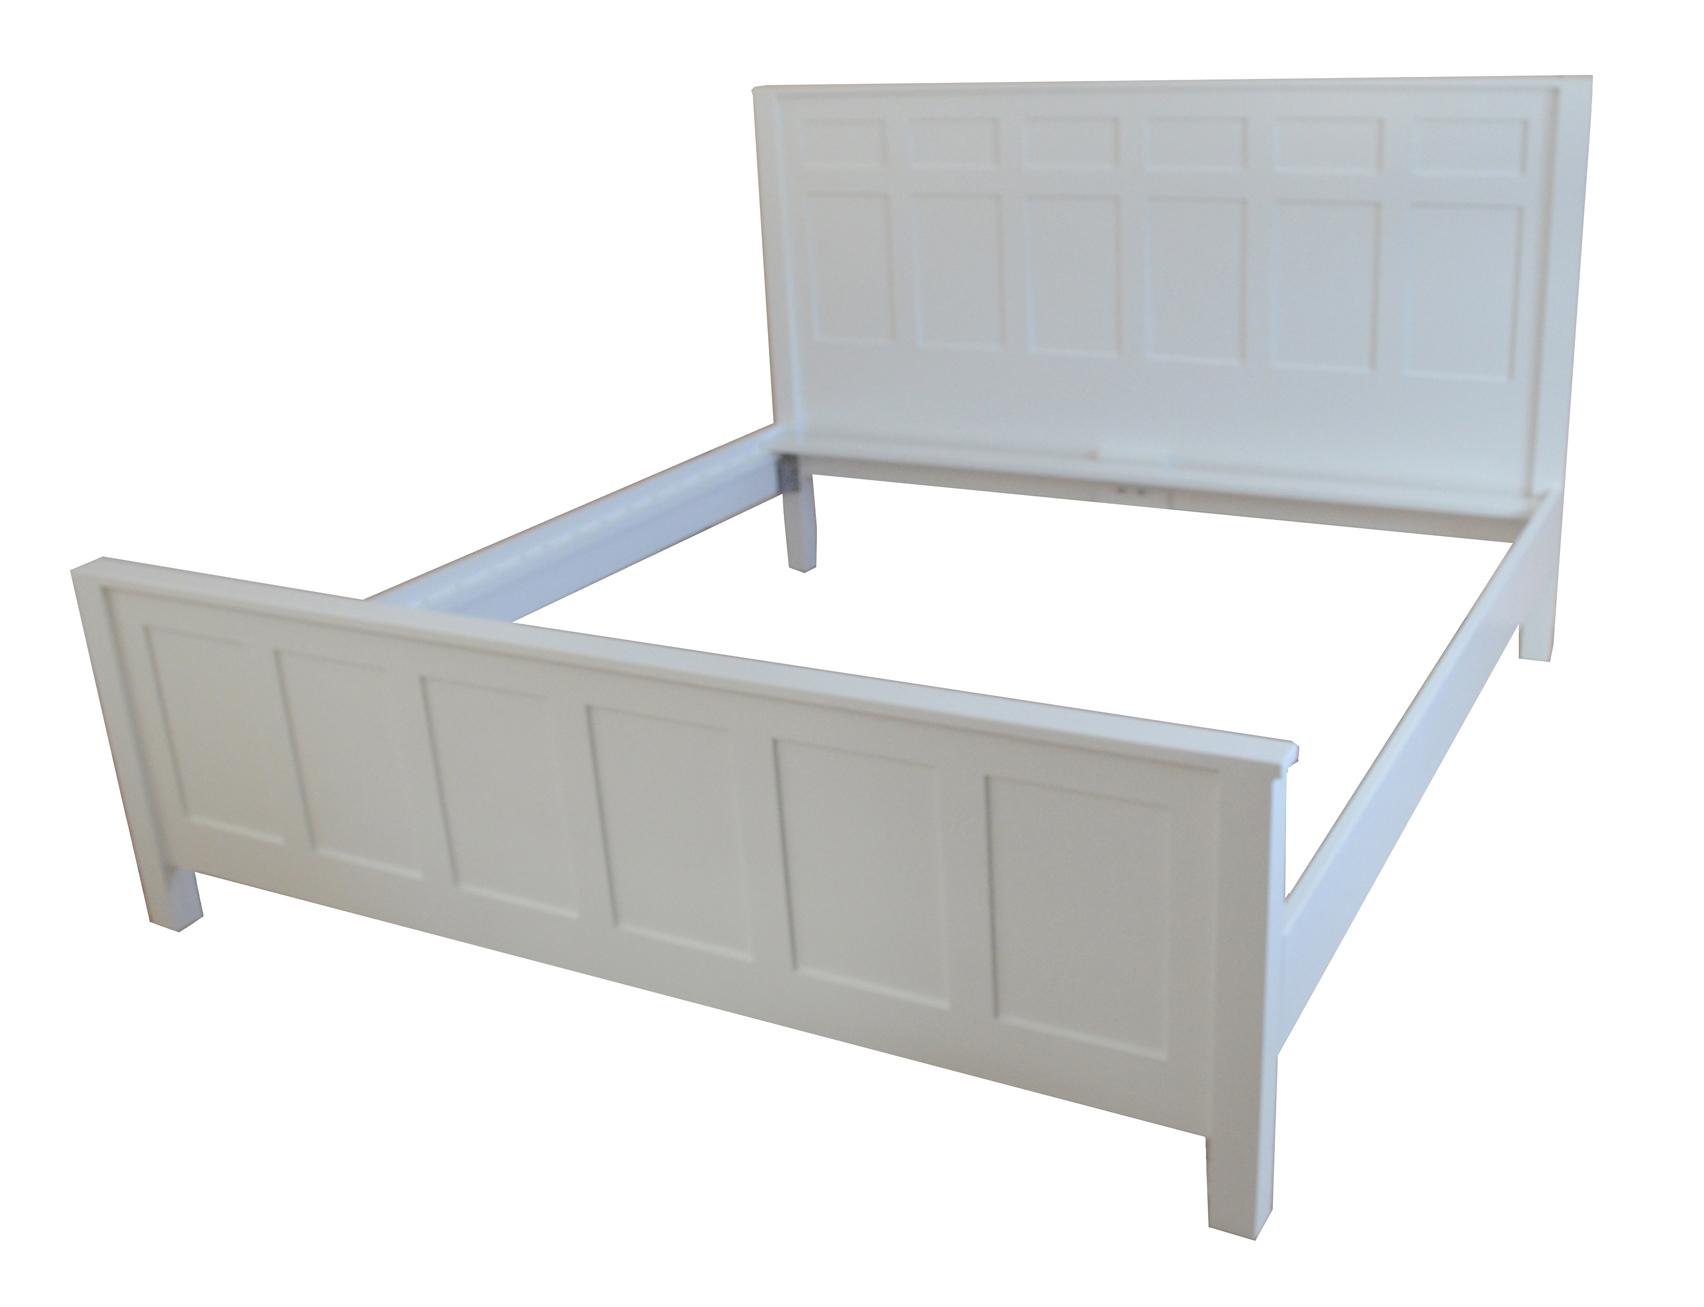 Natural and Organic Bedroom Furniture : Bed Frames